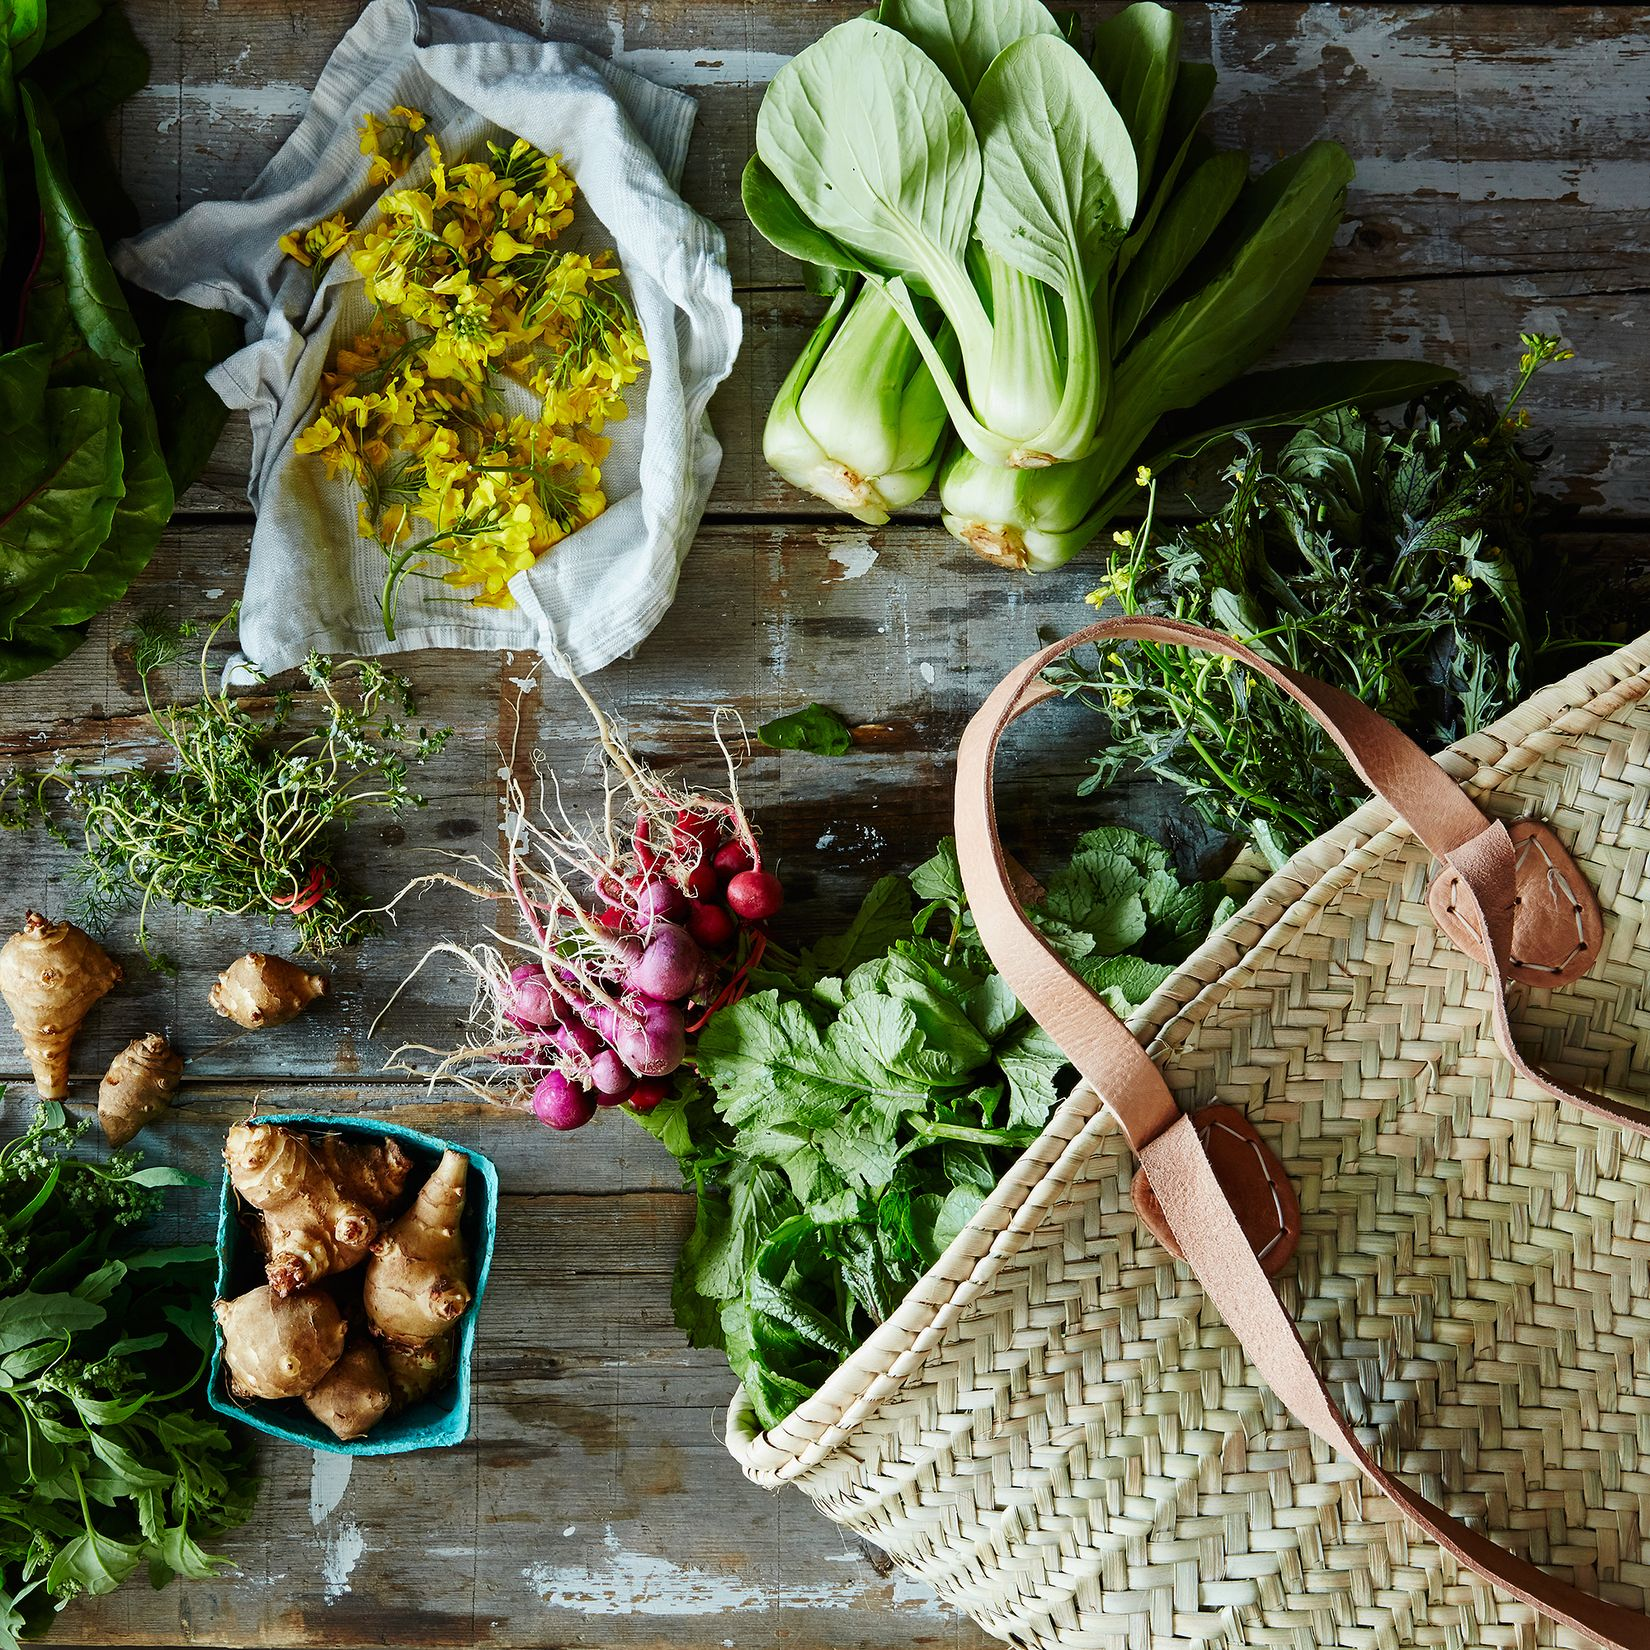 french-market-tote-vegetables-gardenista.jpg